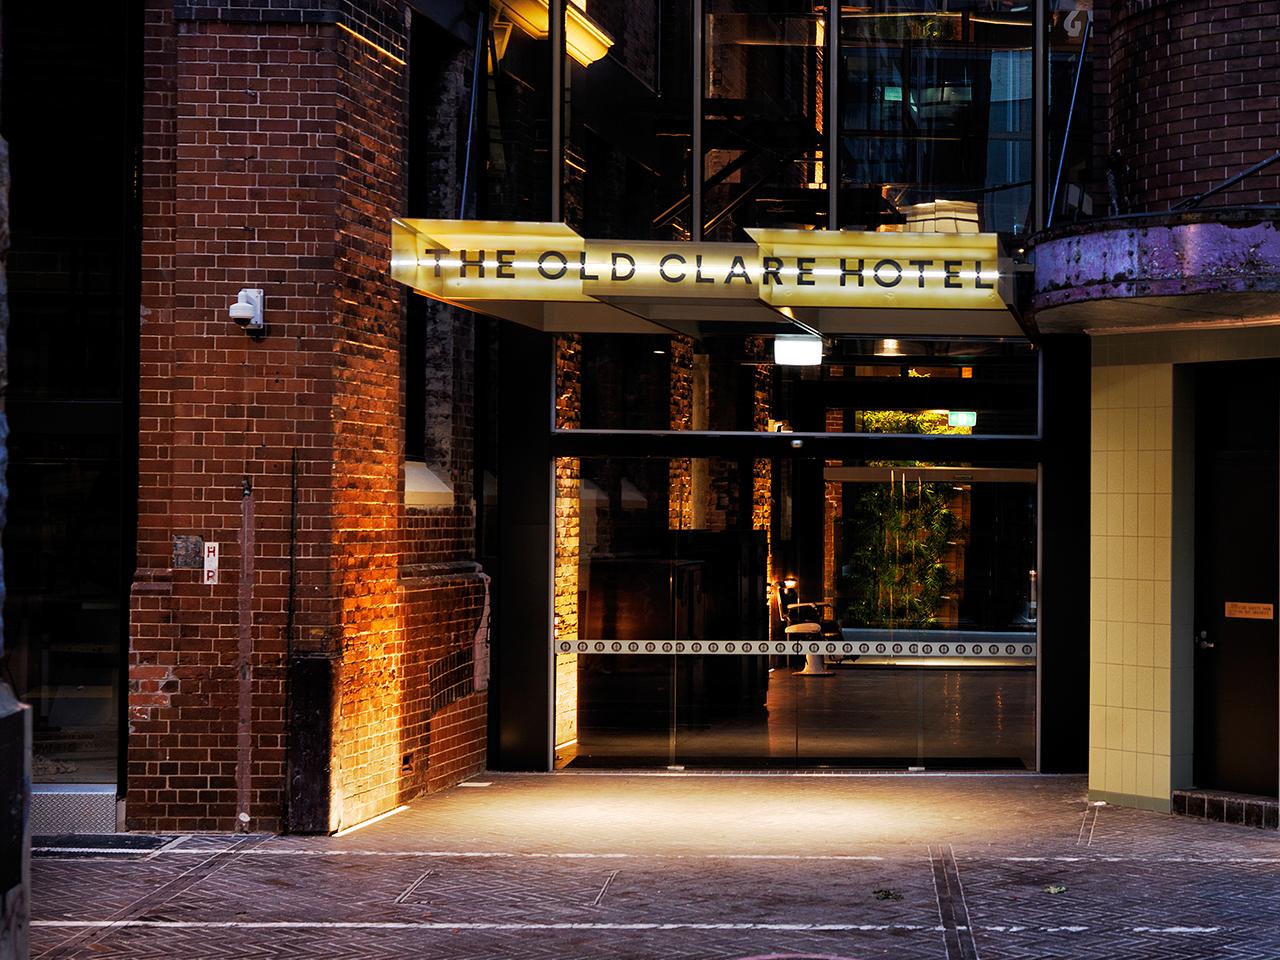 Unique Sleeps: The Old Clare Hotel, Sydney, Australia